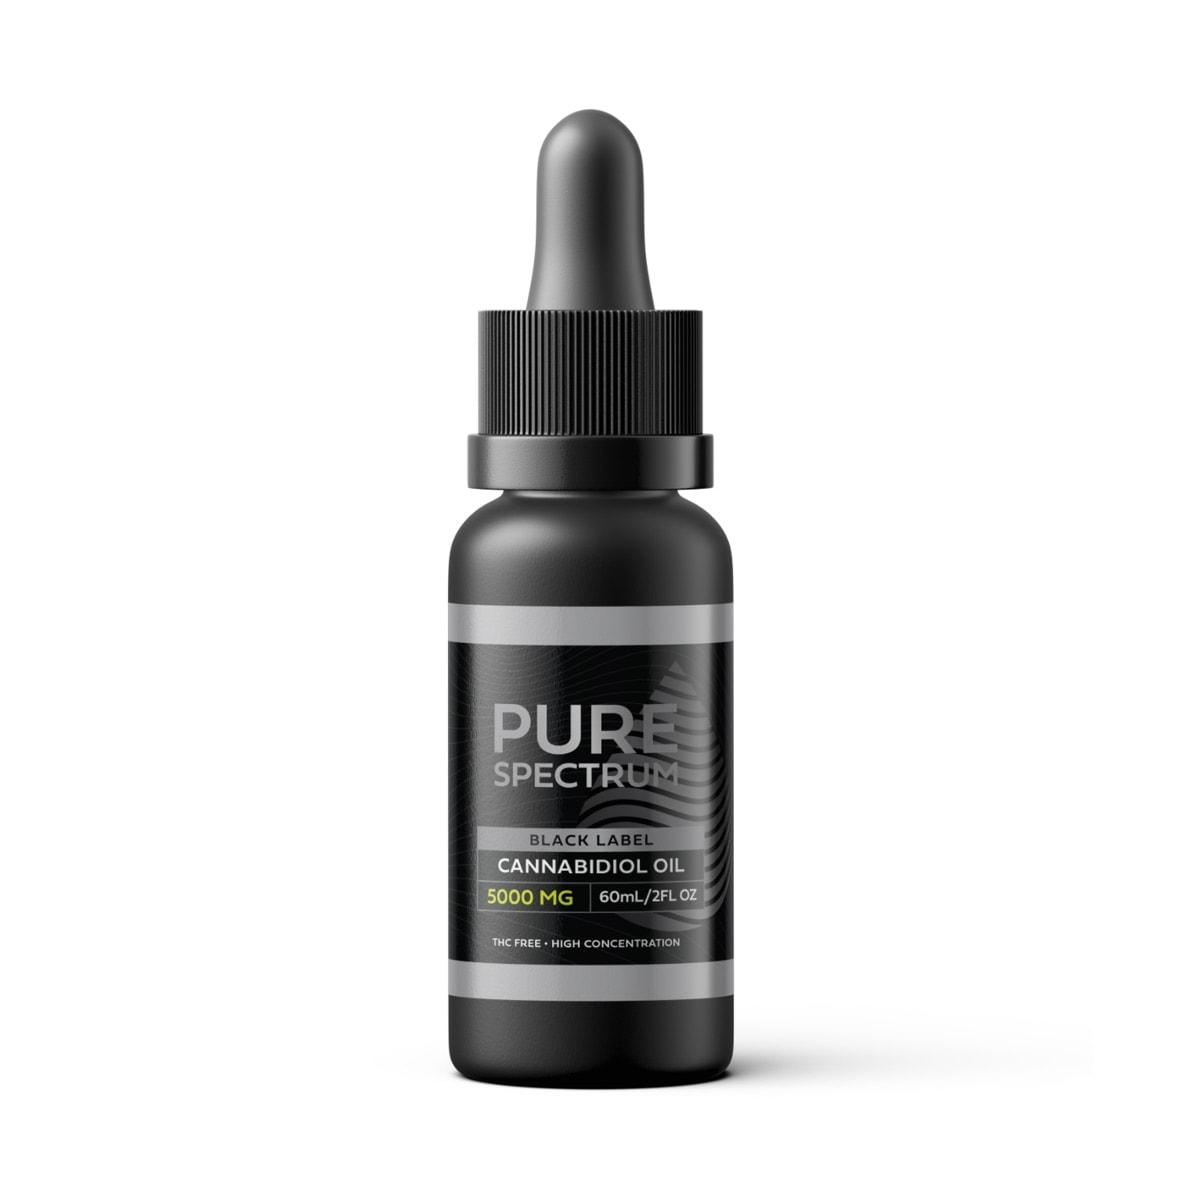 Pure Spectrum, Black Label Cannabidiol Oil, Broad Spectrum THC-Free, 2oz, 5000mg of CBD2